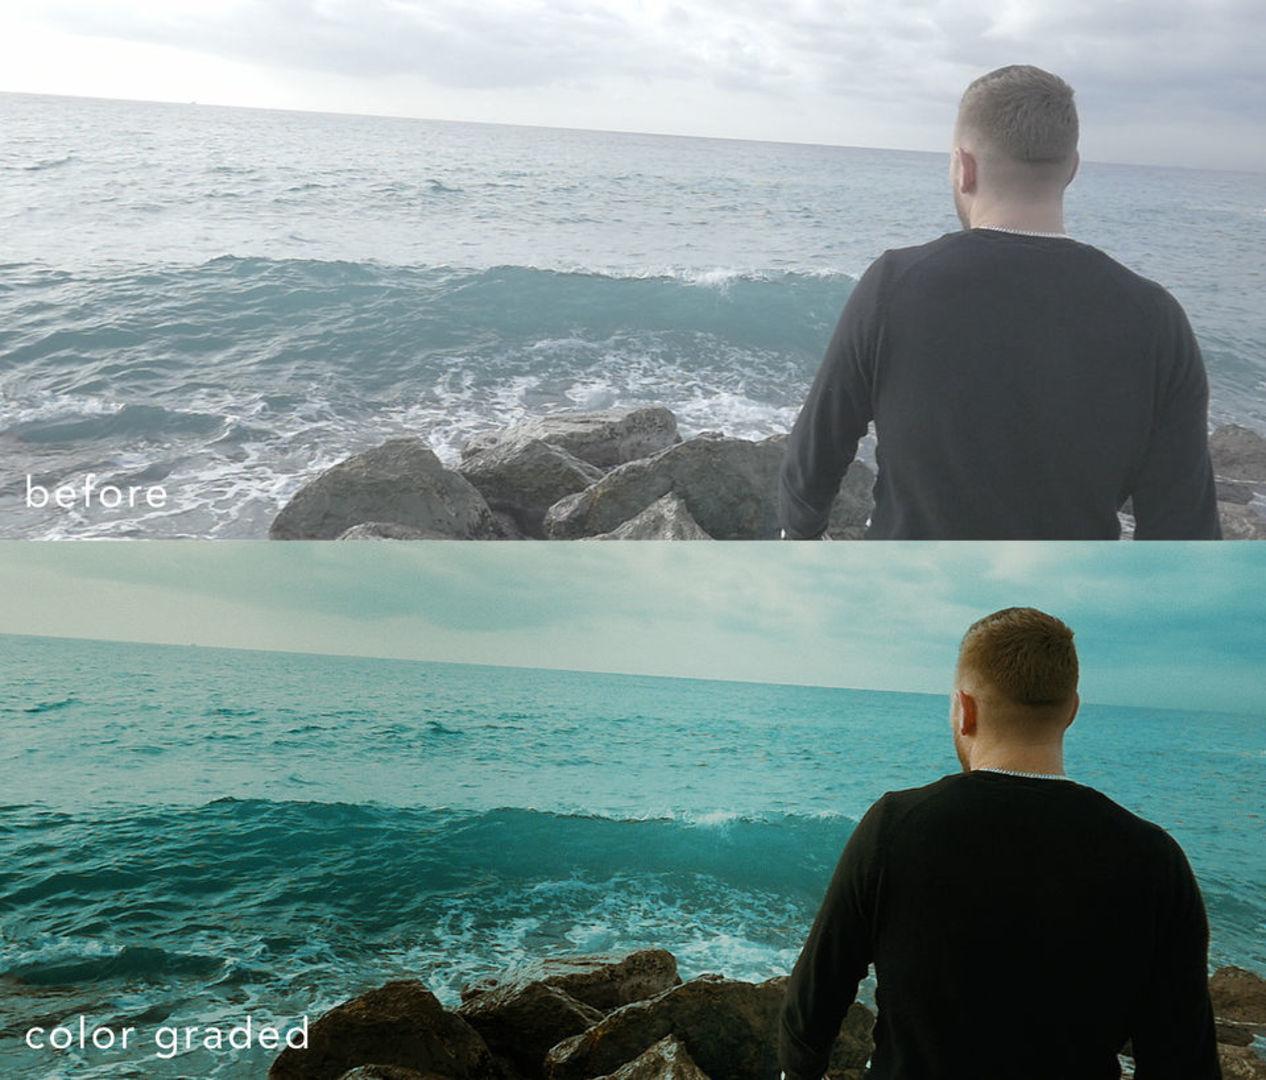 color grading: musikvideo von peah